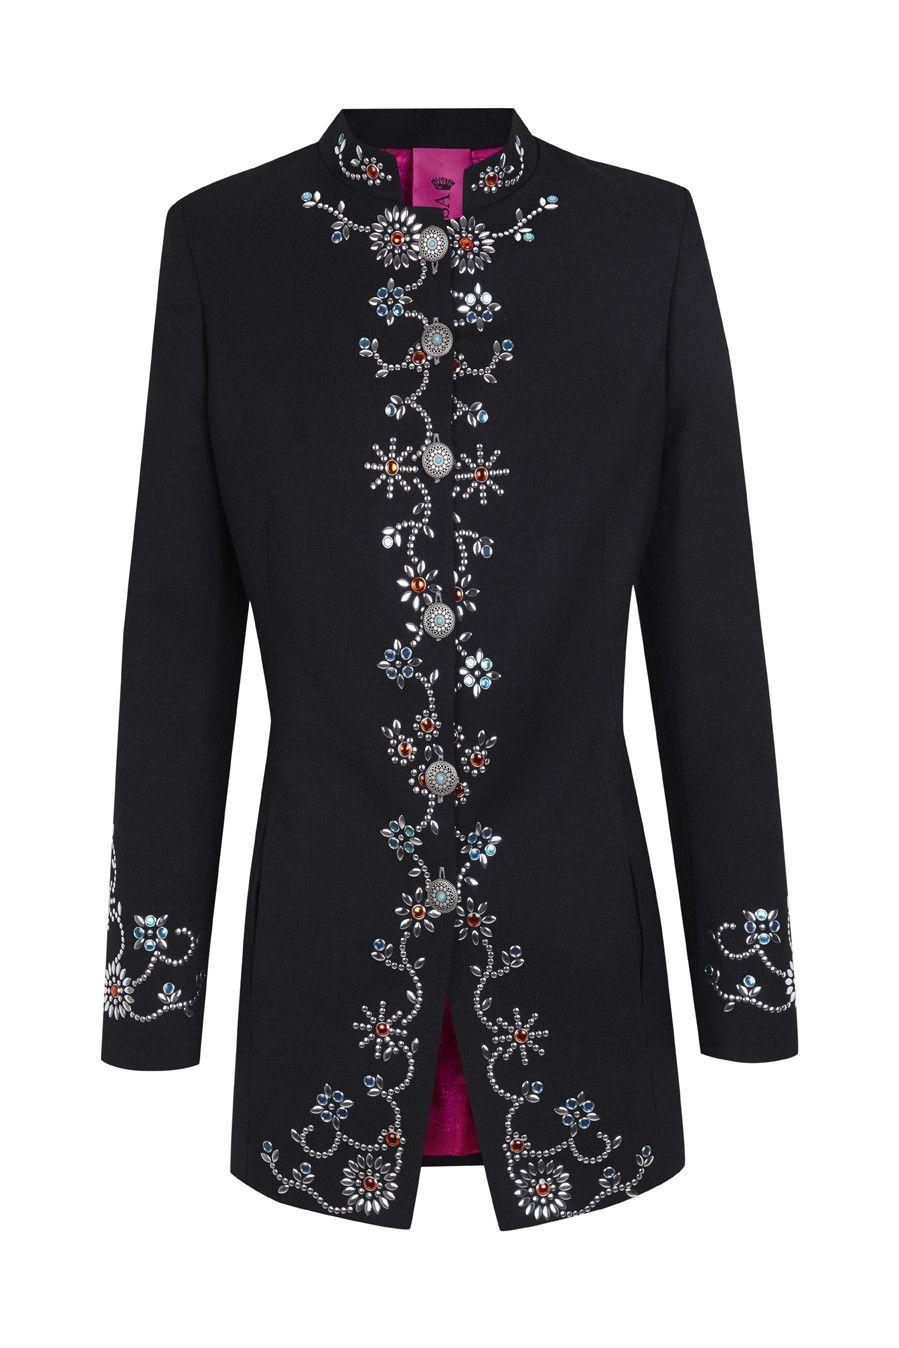 Latest La Condesa Dark Blue Vizcondesa Beatle Jacket For Women Online Sale